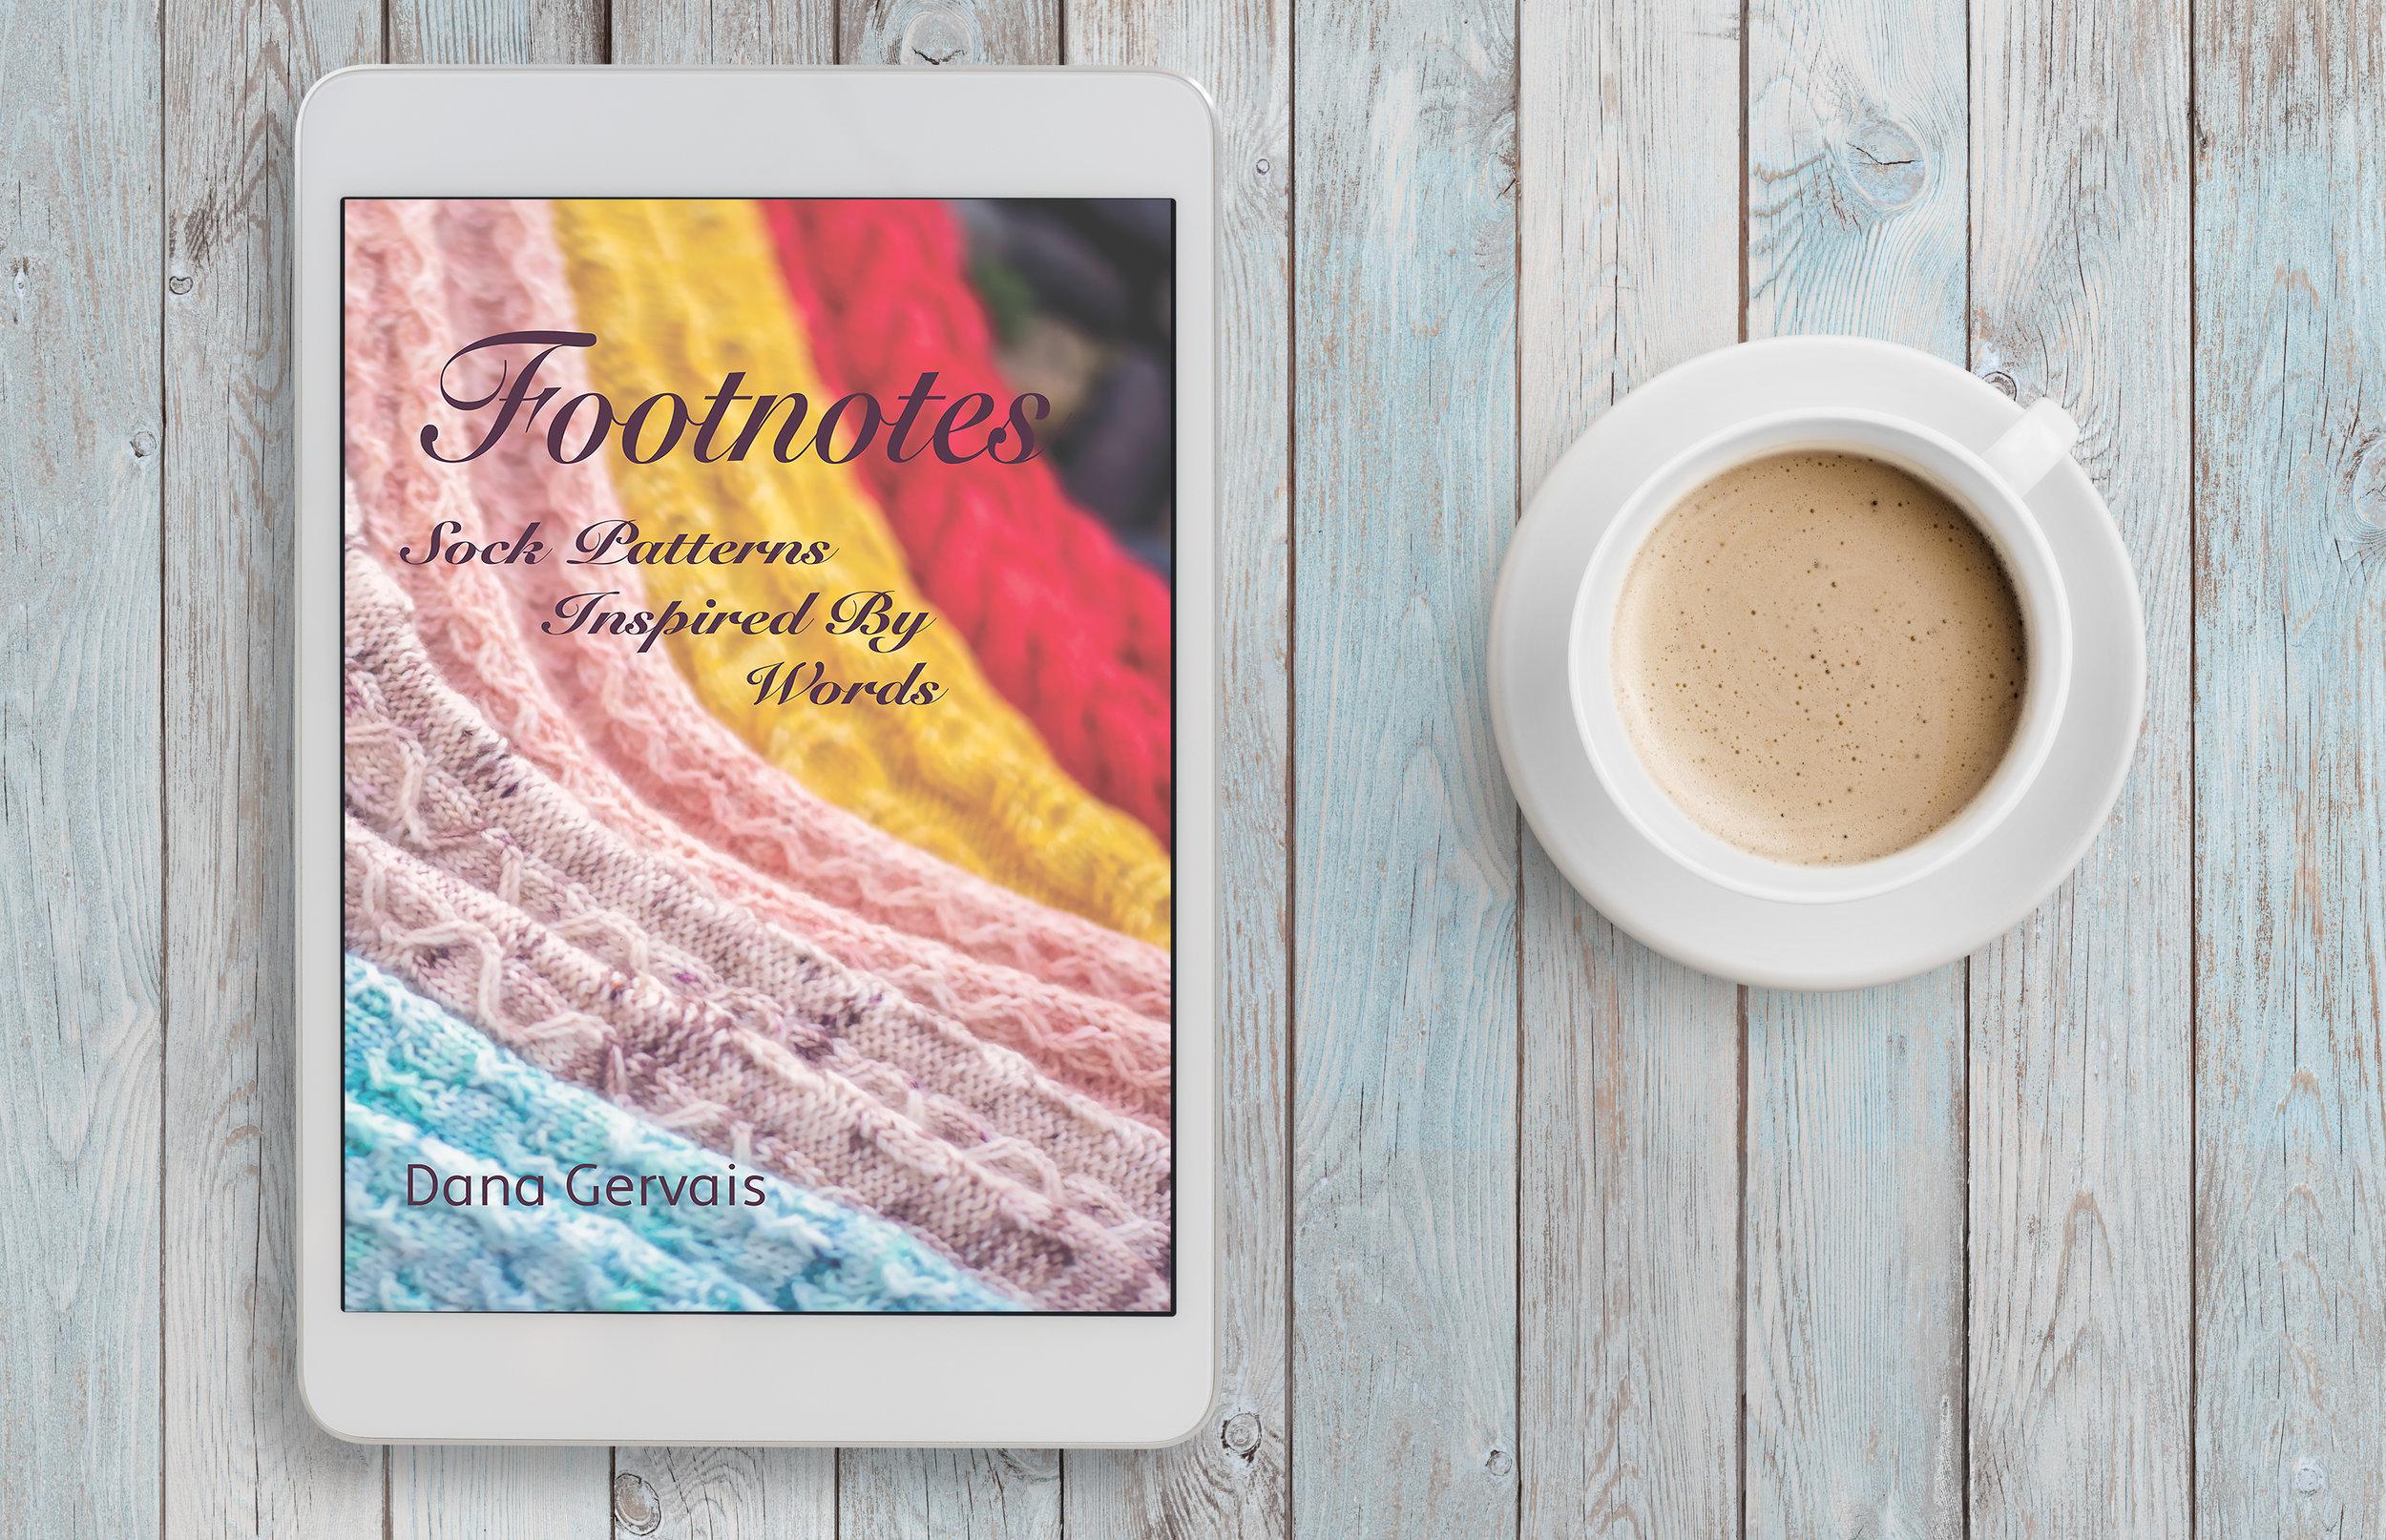 Footnotes ebook cover